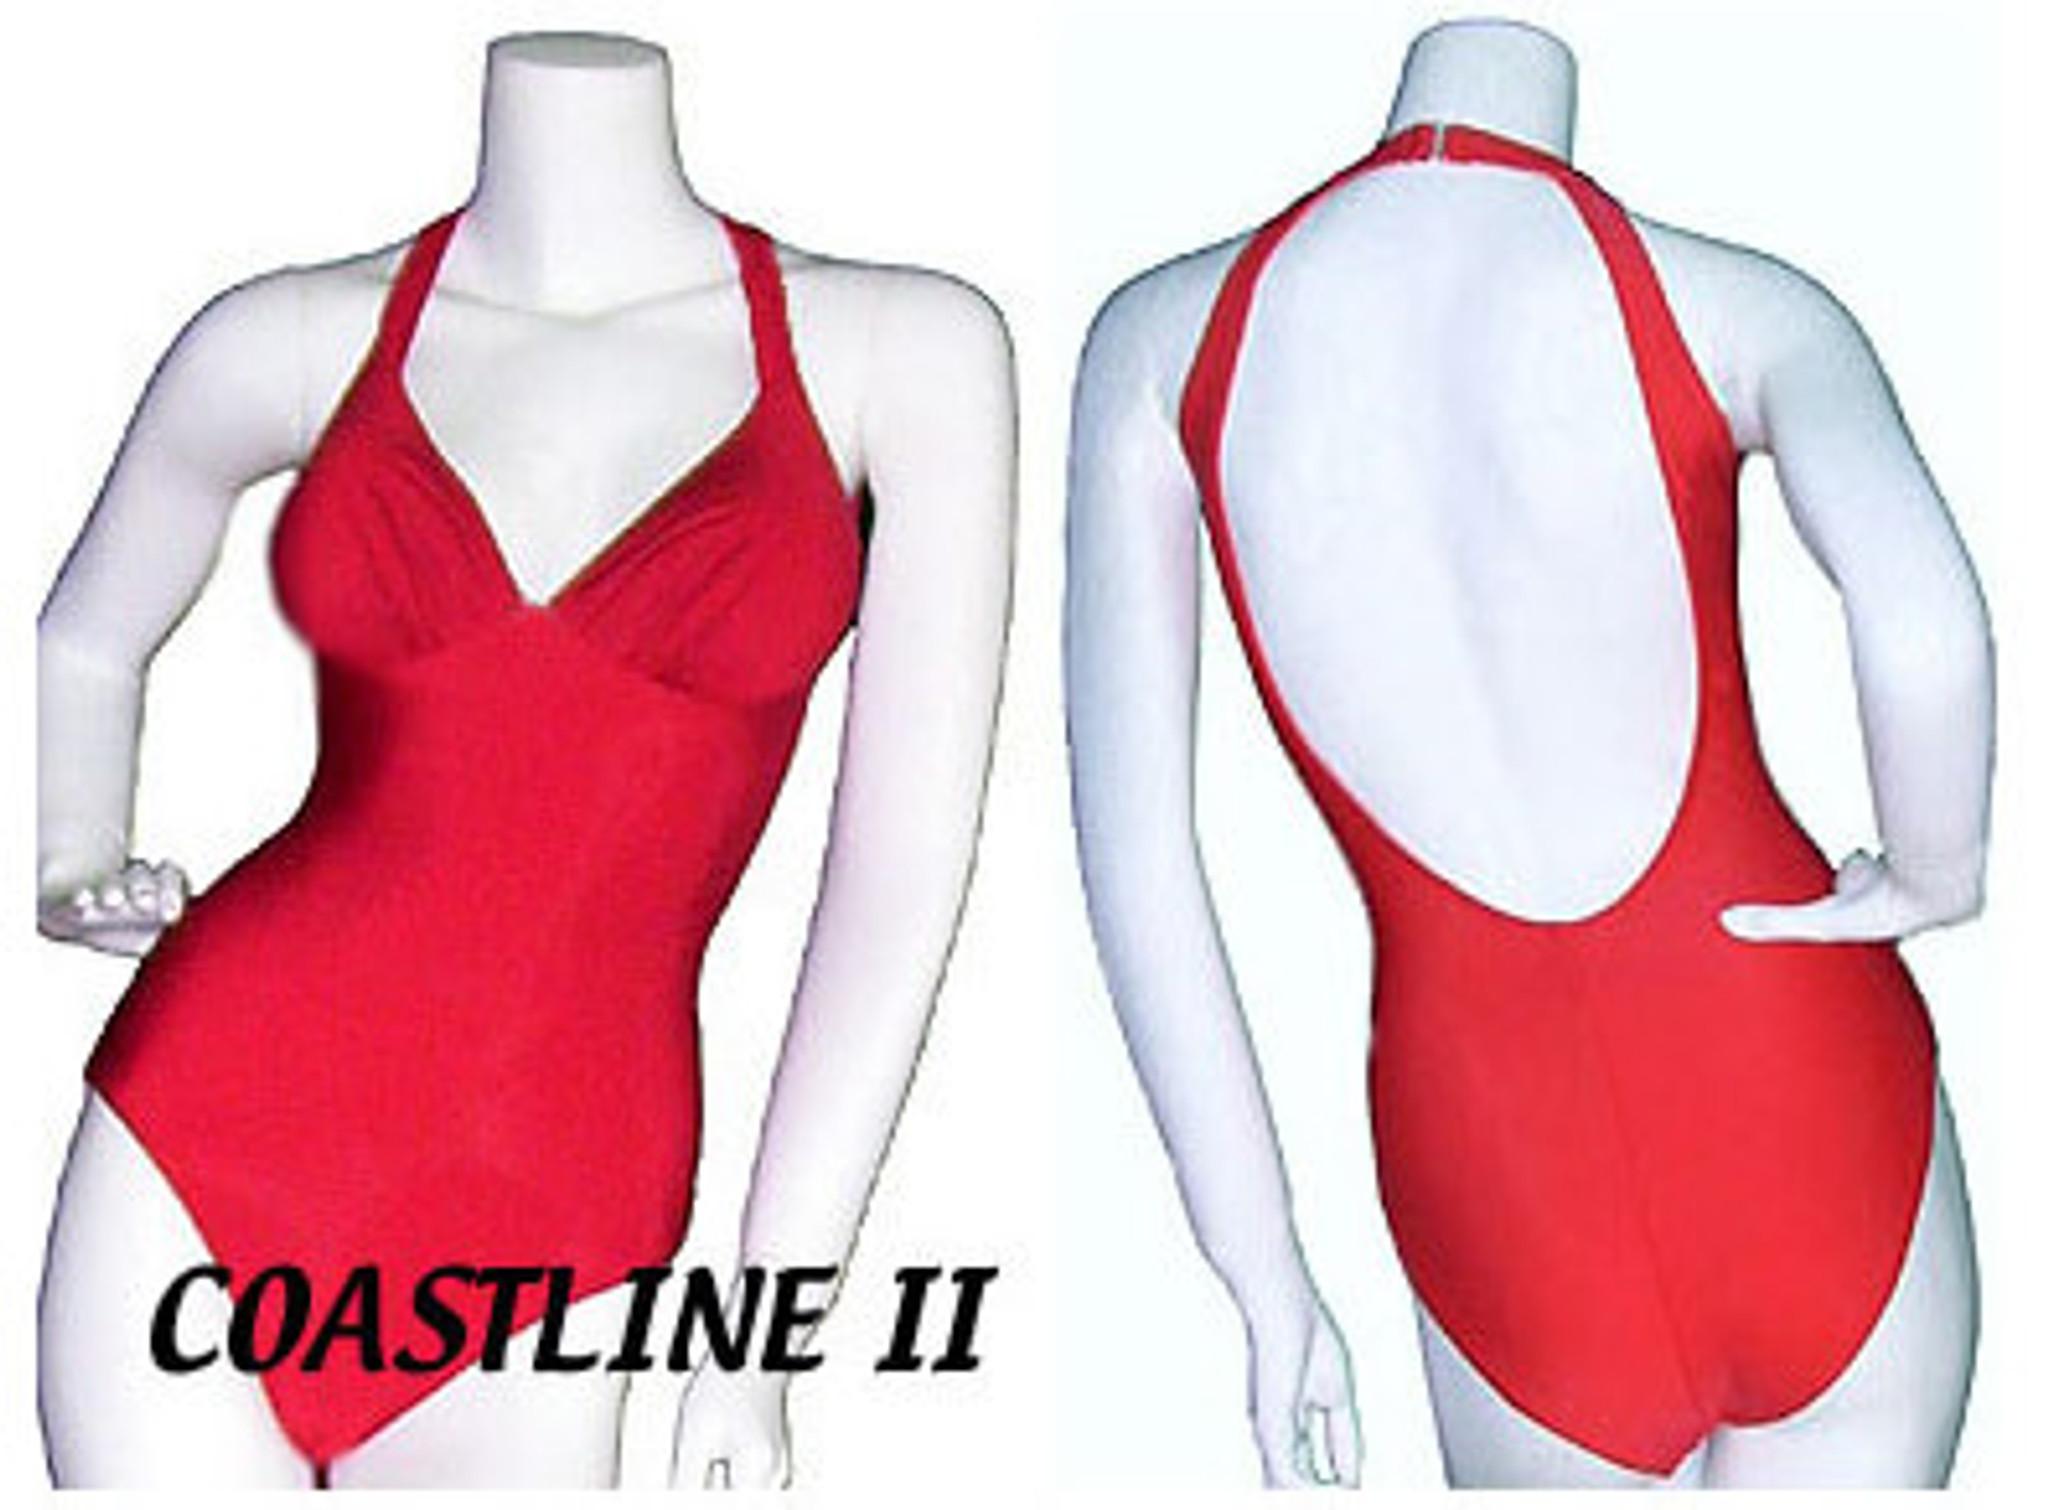 Pageant Swimwear Coastline II 1-Piece